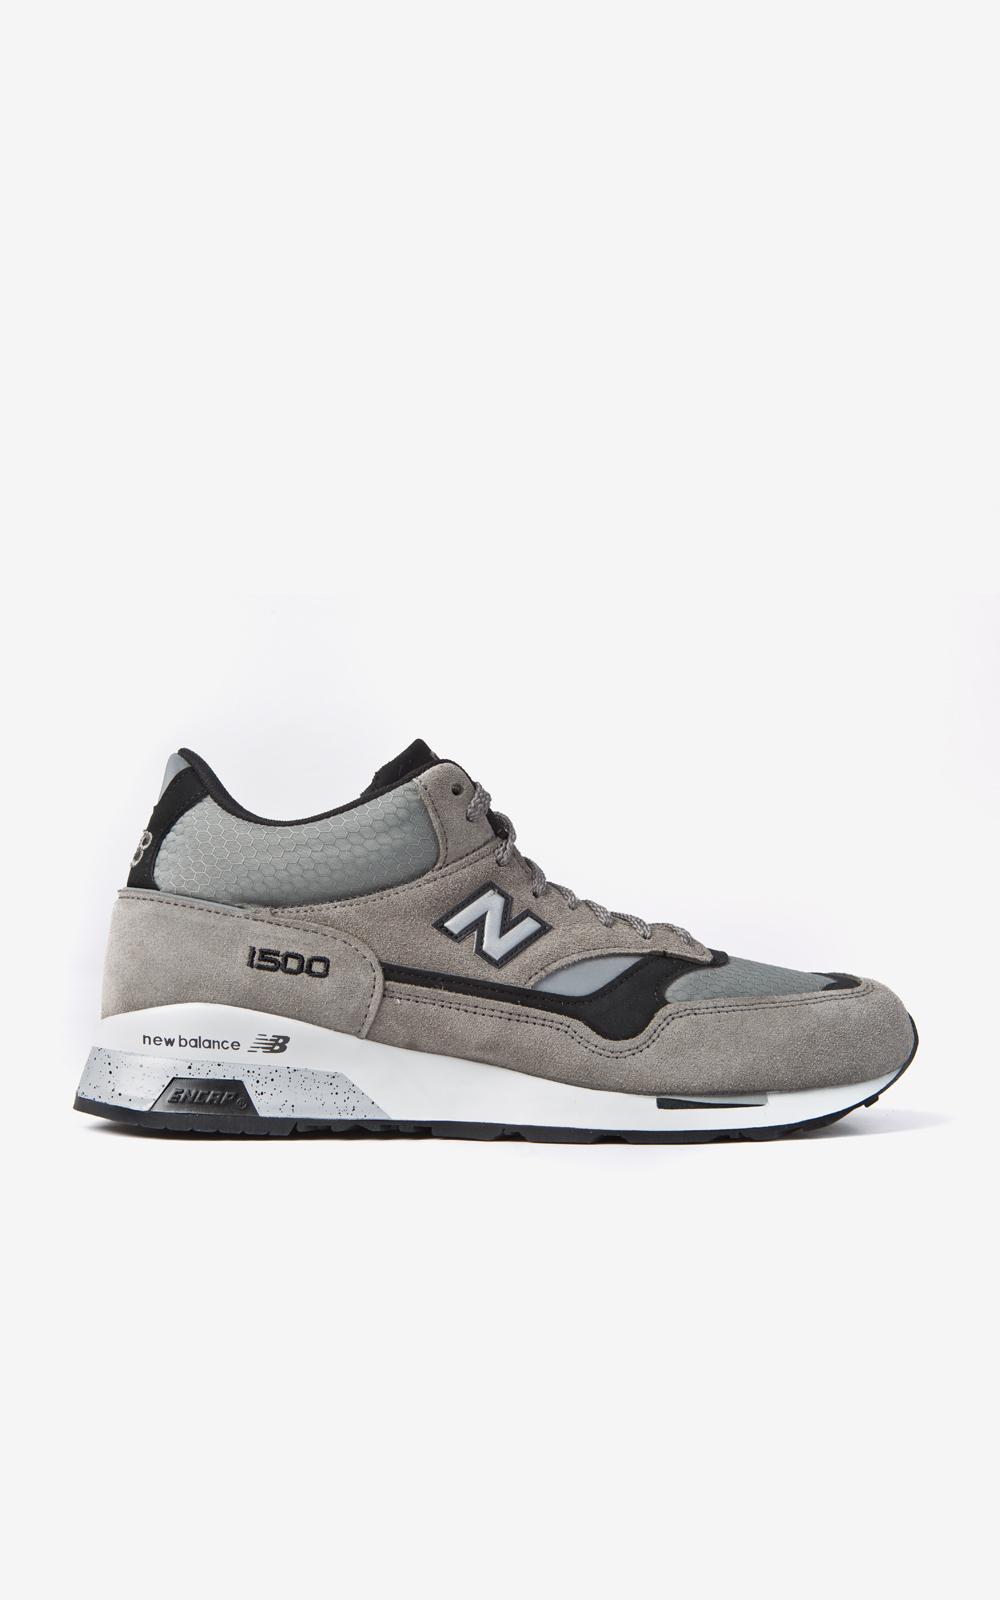 hot sale online 1c2d8 26001 New Balance Gray Mh1500 Gg Grey